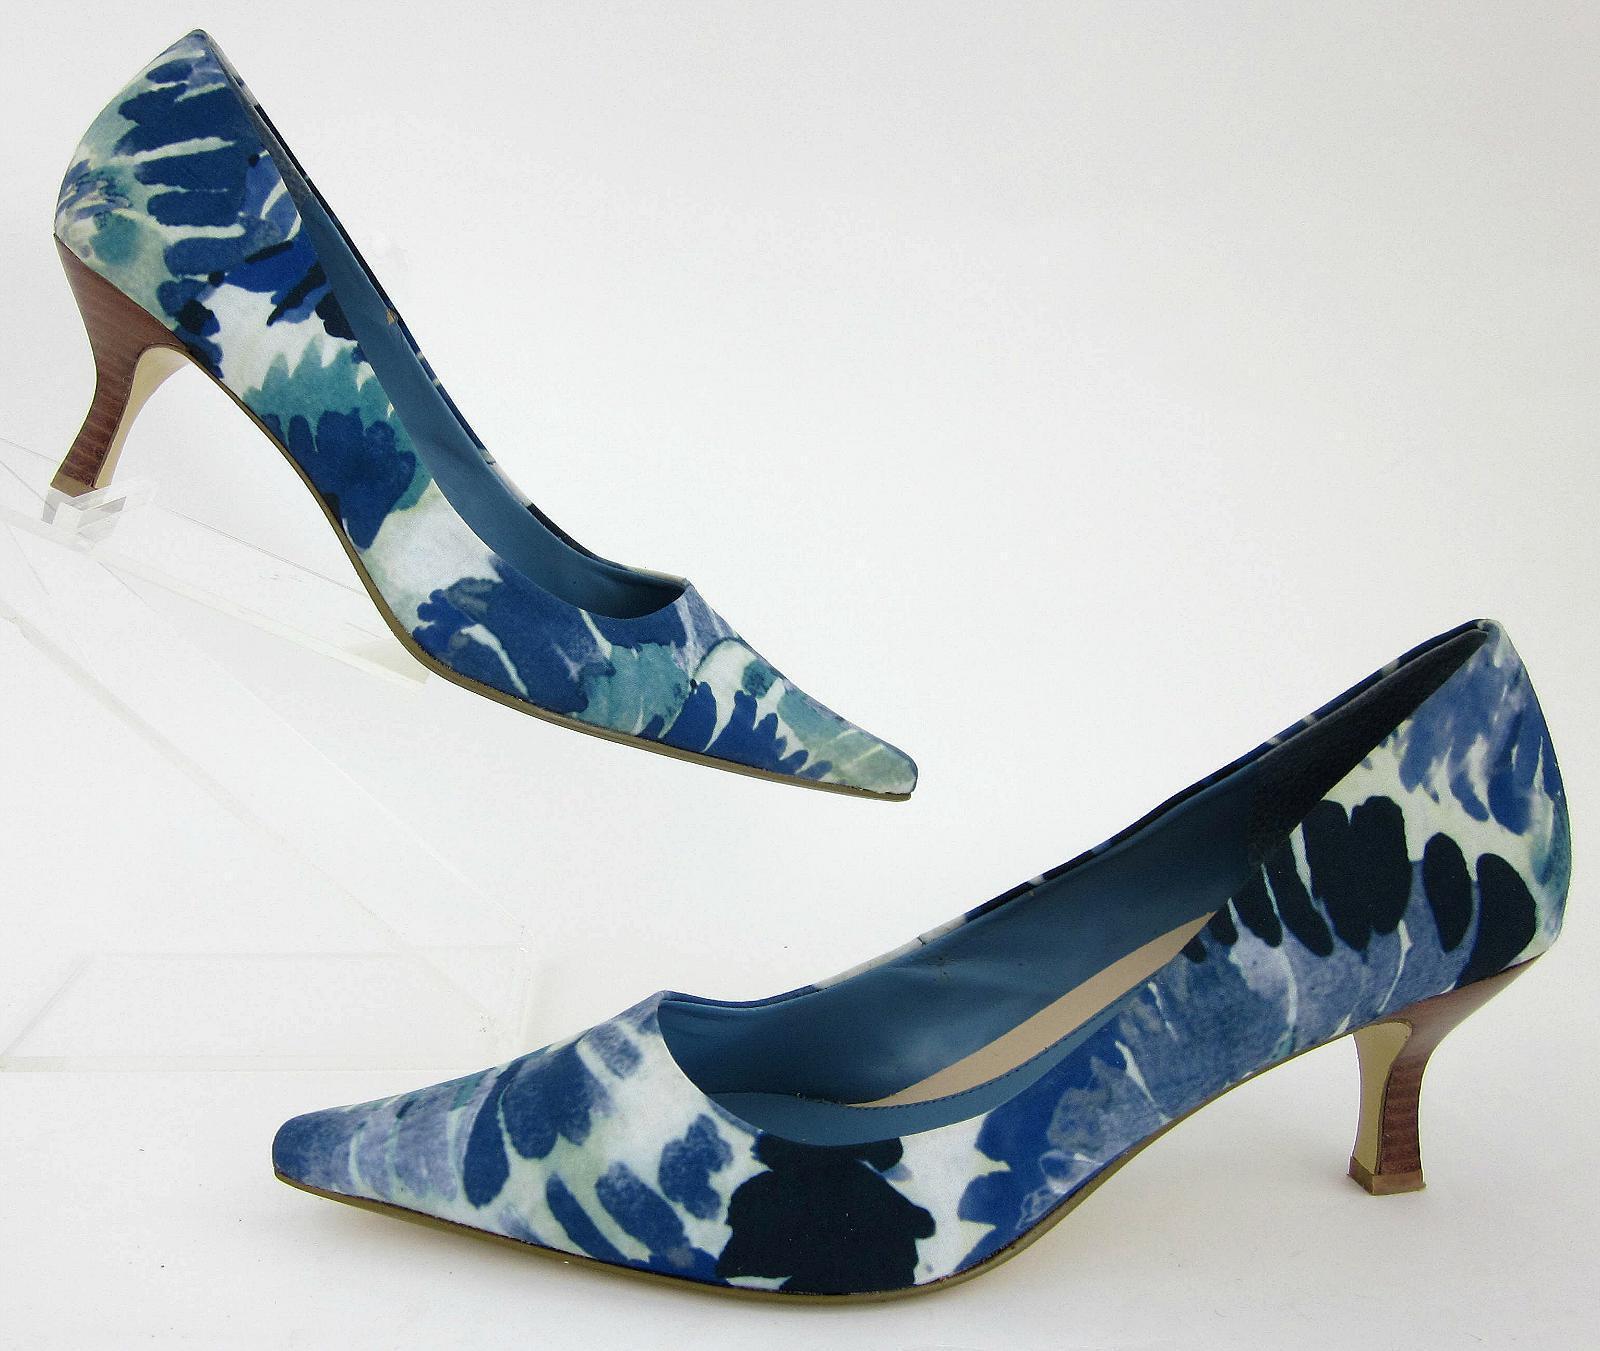 Bandolino 'Cheetah' Point Toe Pumps Fabric bluee Mosaic Wave Sz 9M